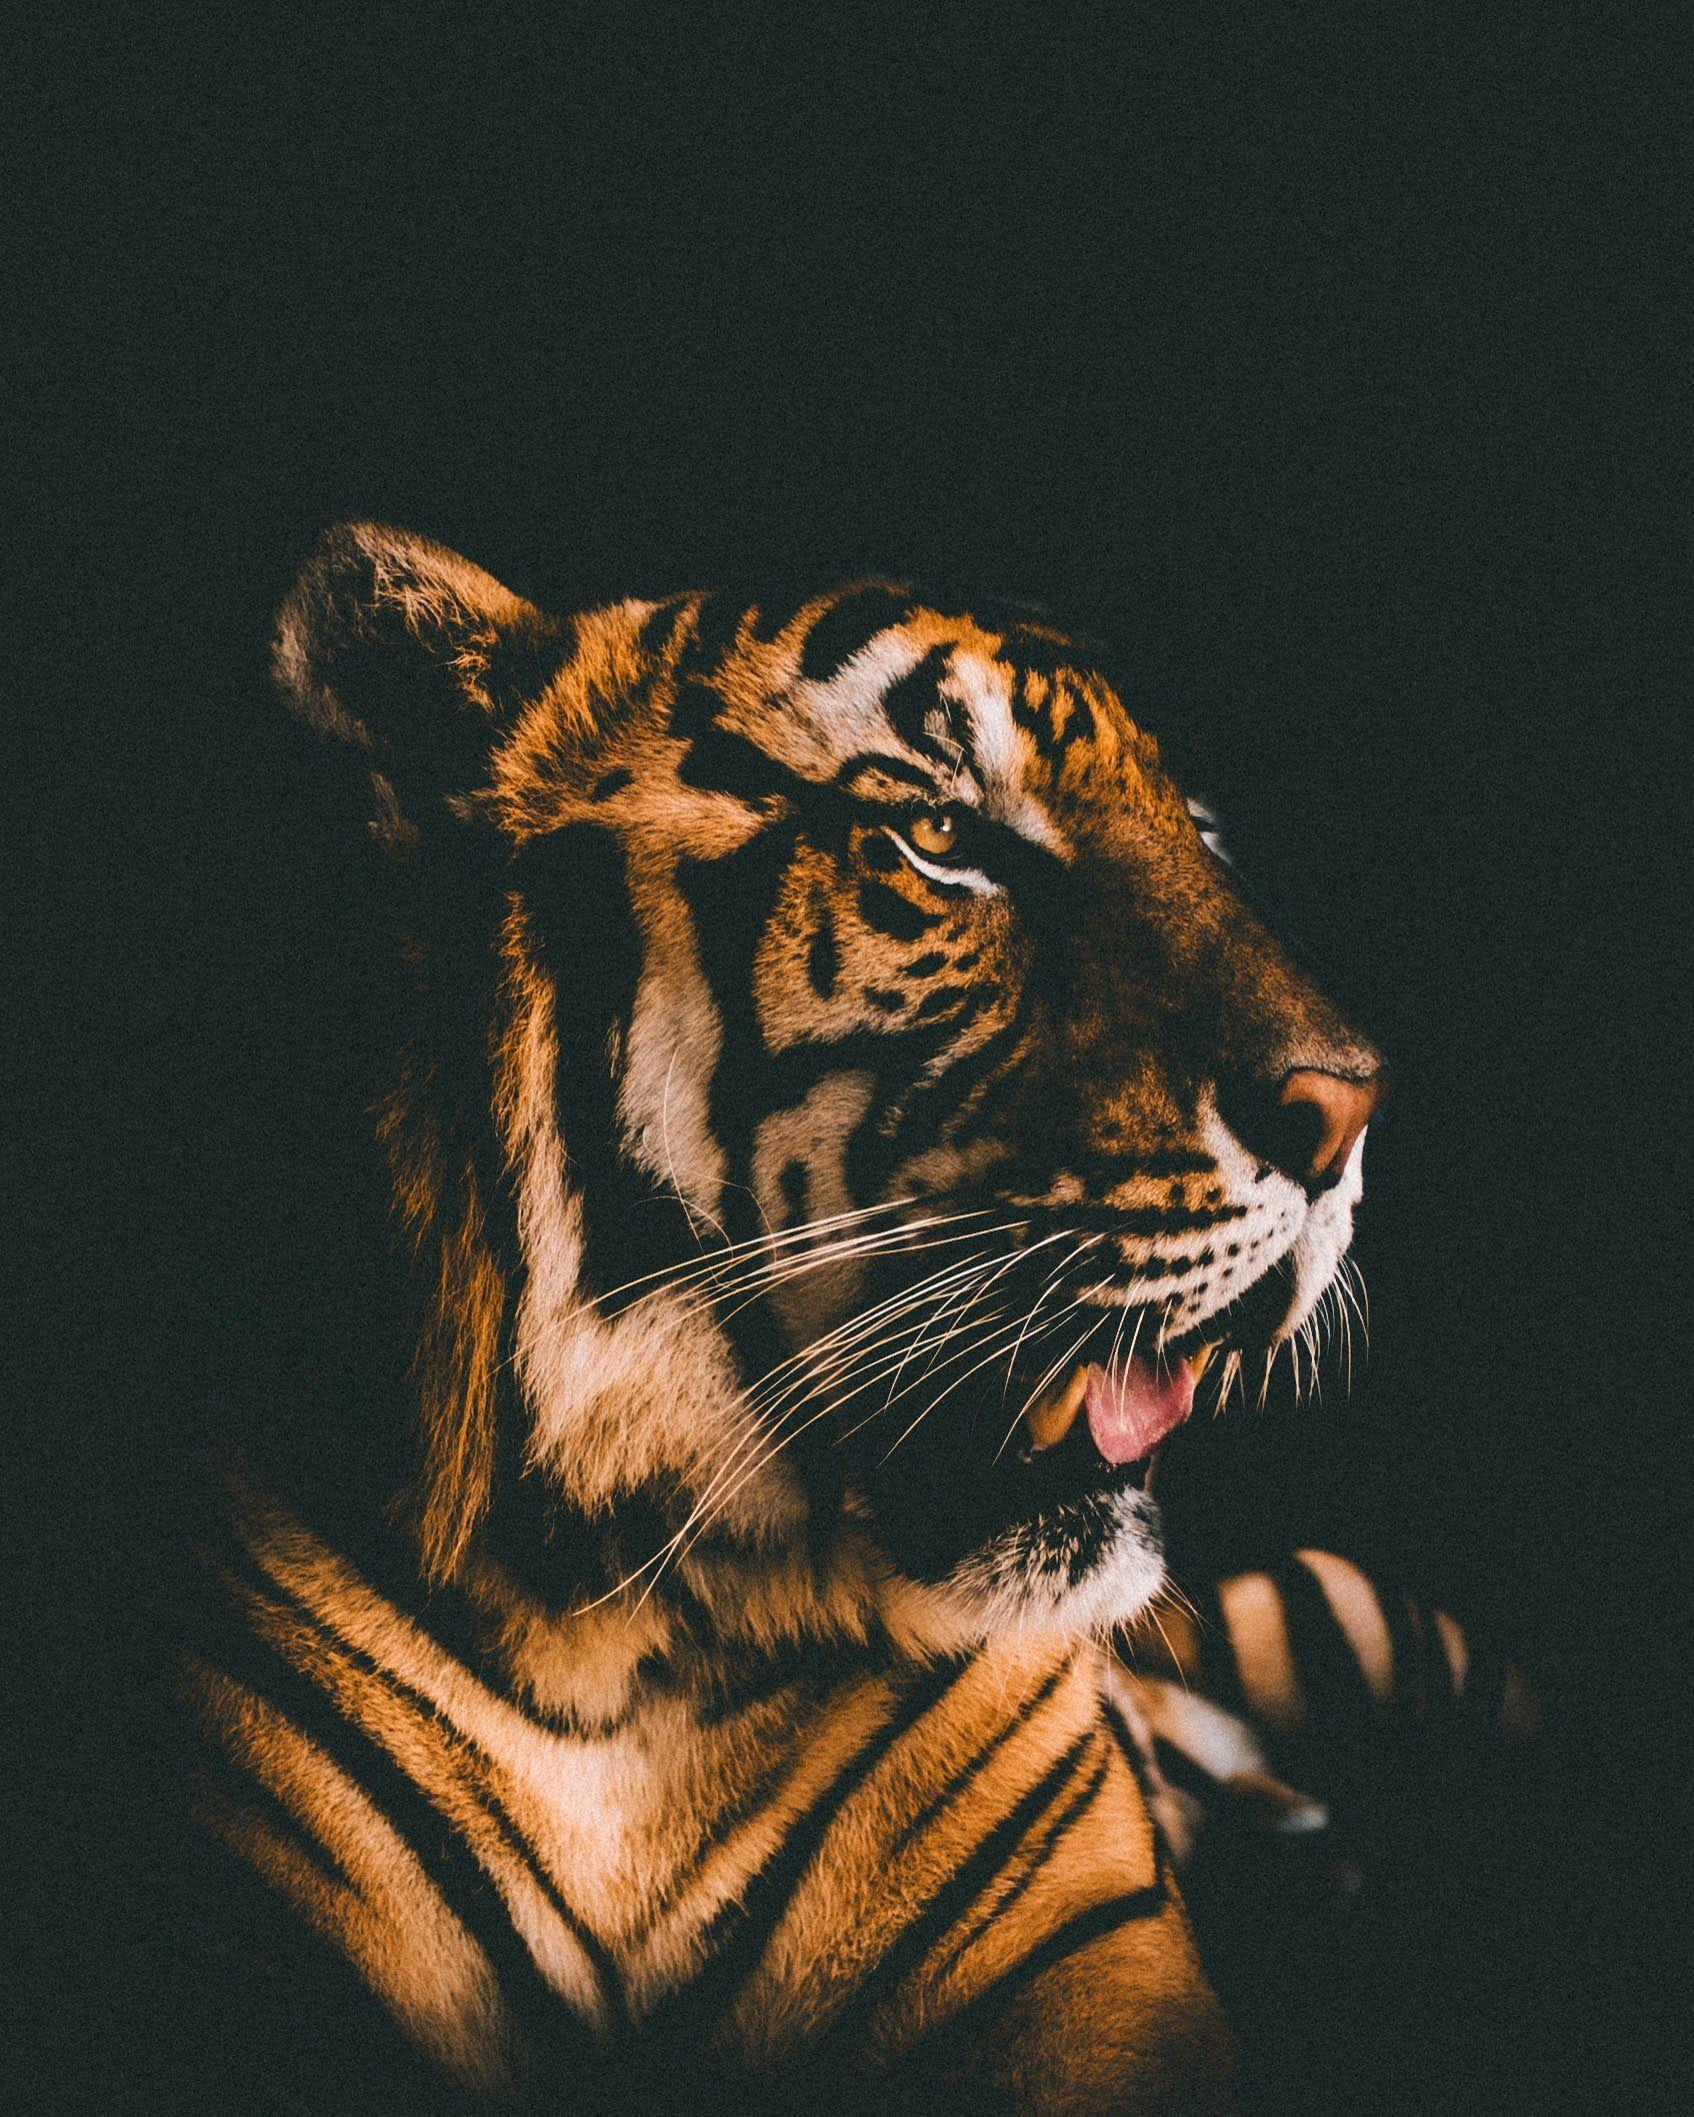 Pin On Animal Wildlife Photography